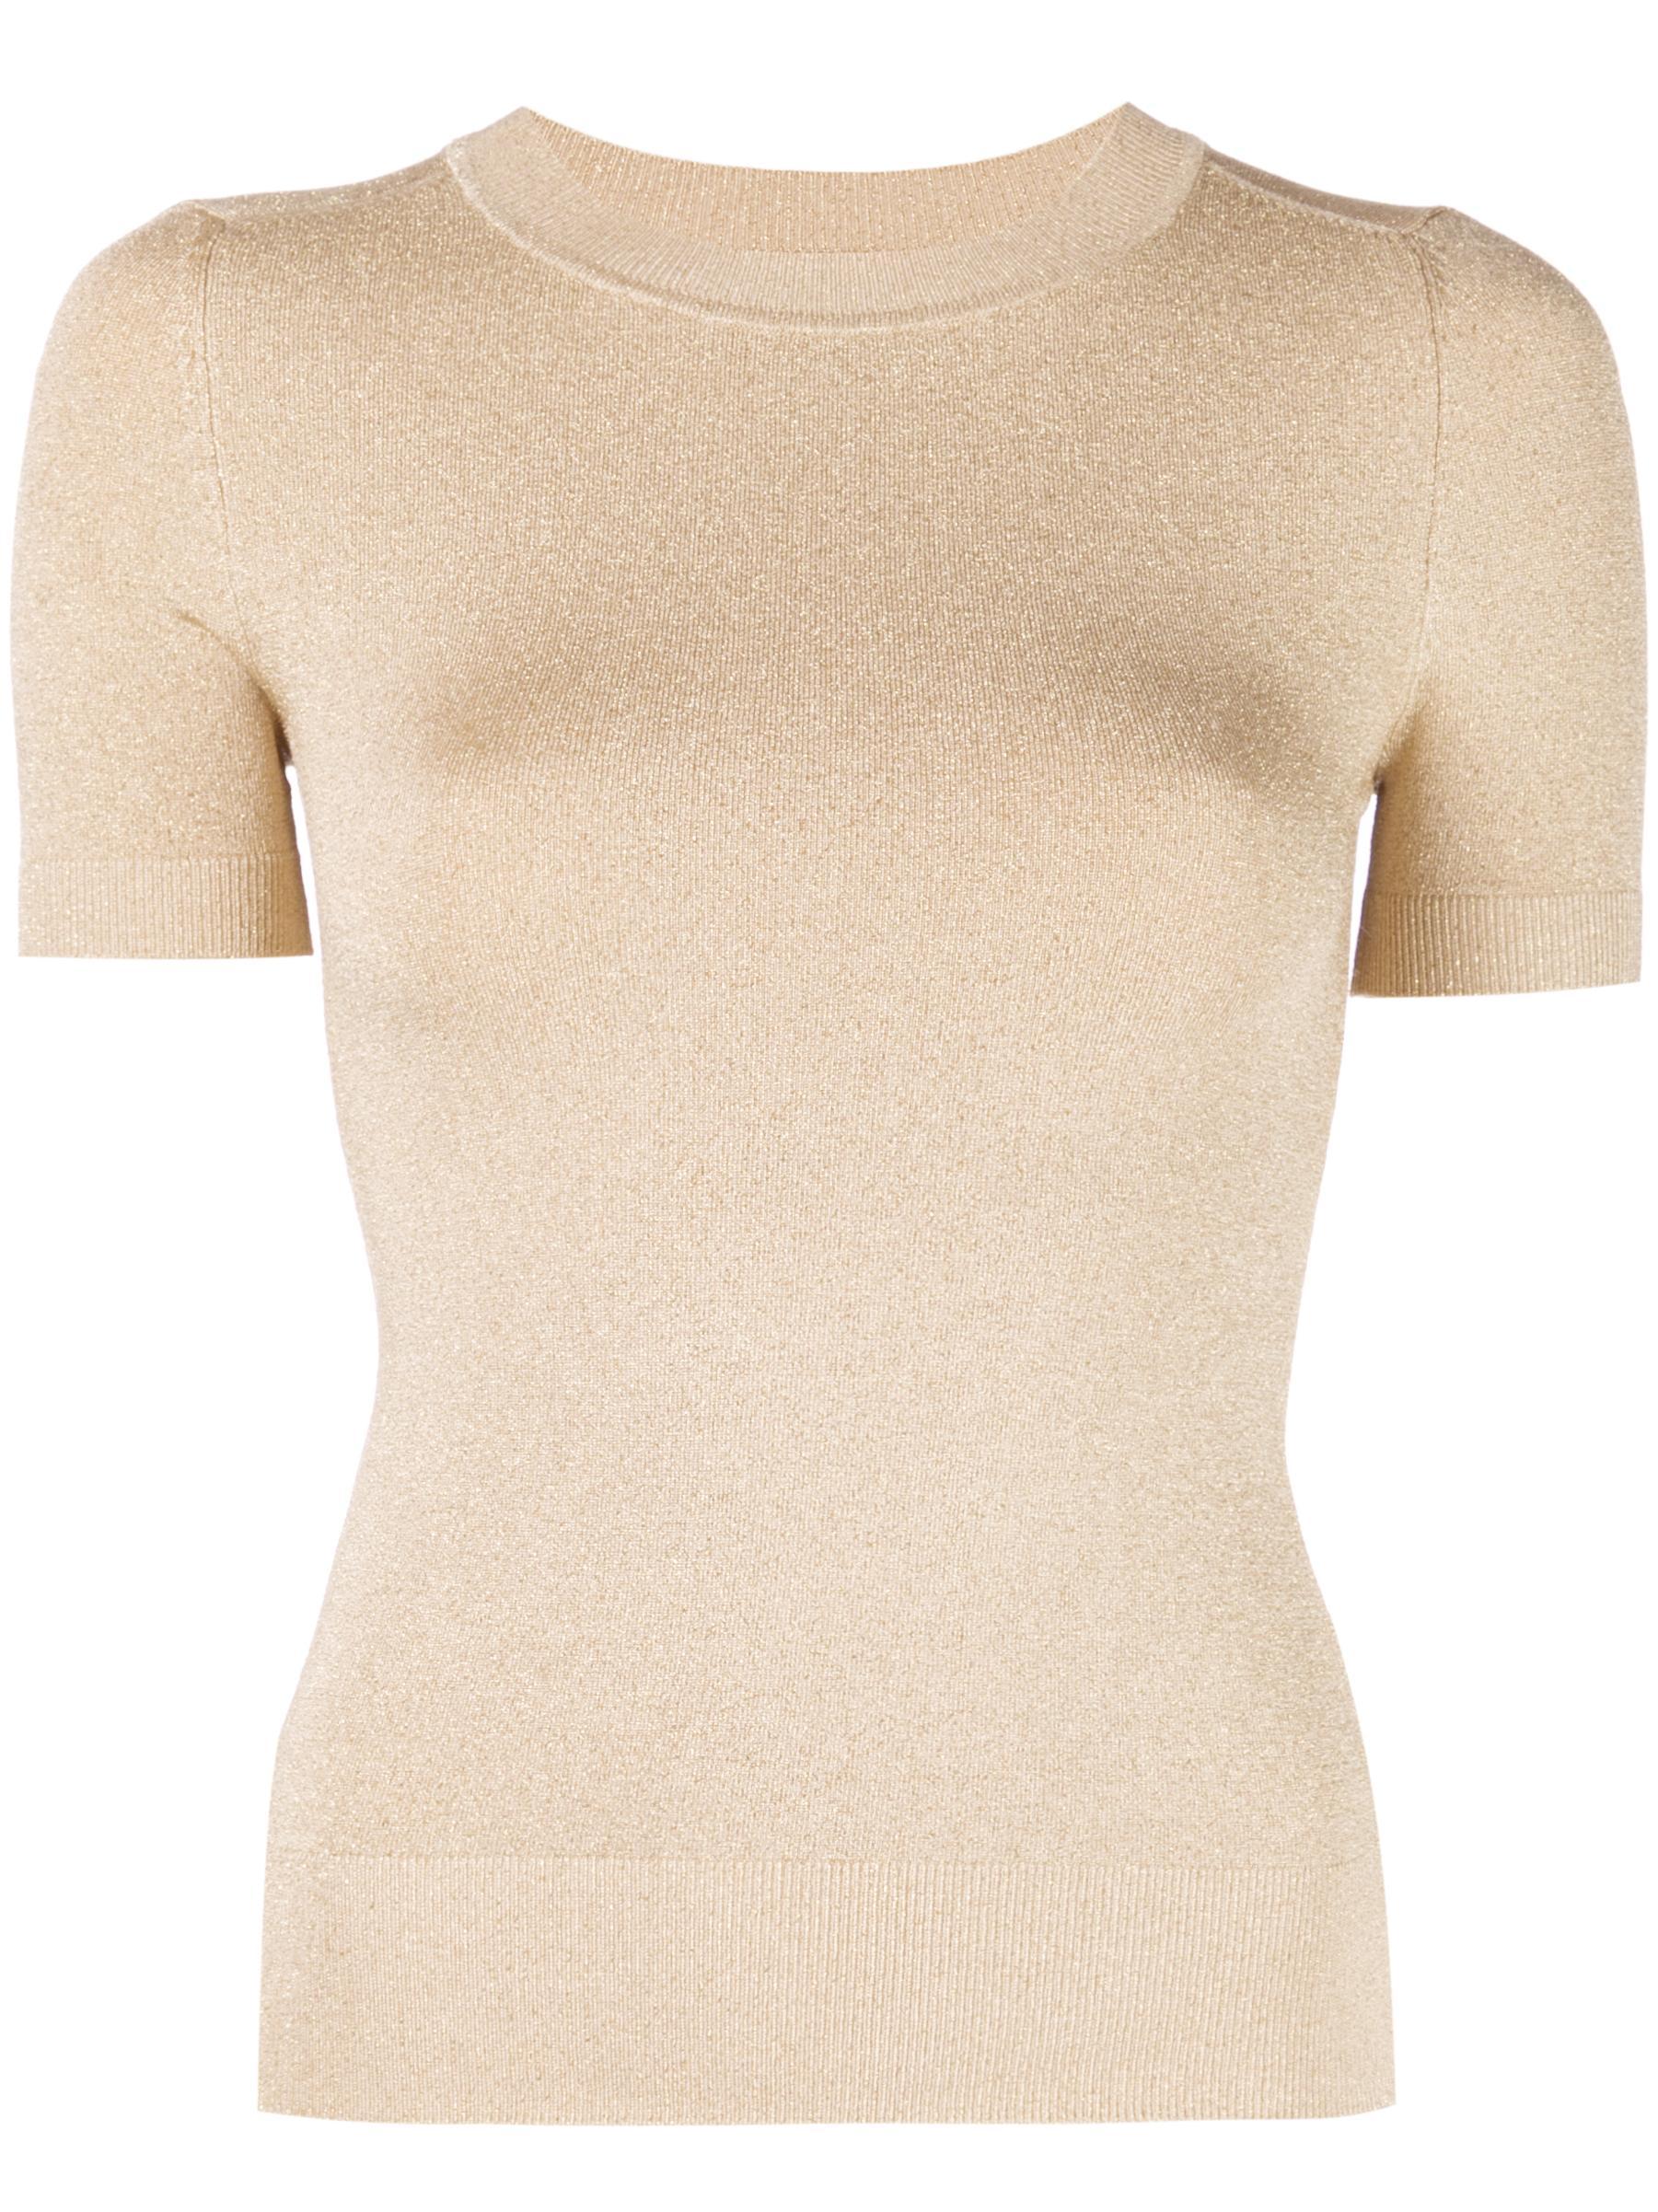 Shortsleeve Solid Lurex Crewneck Sweater